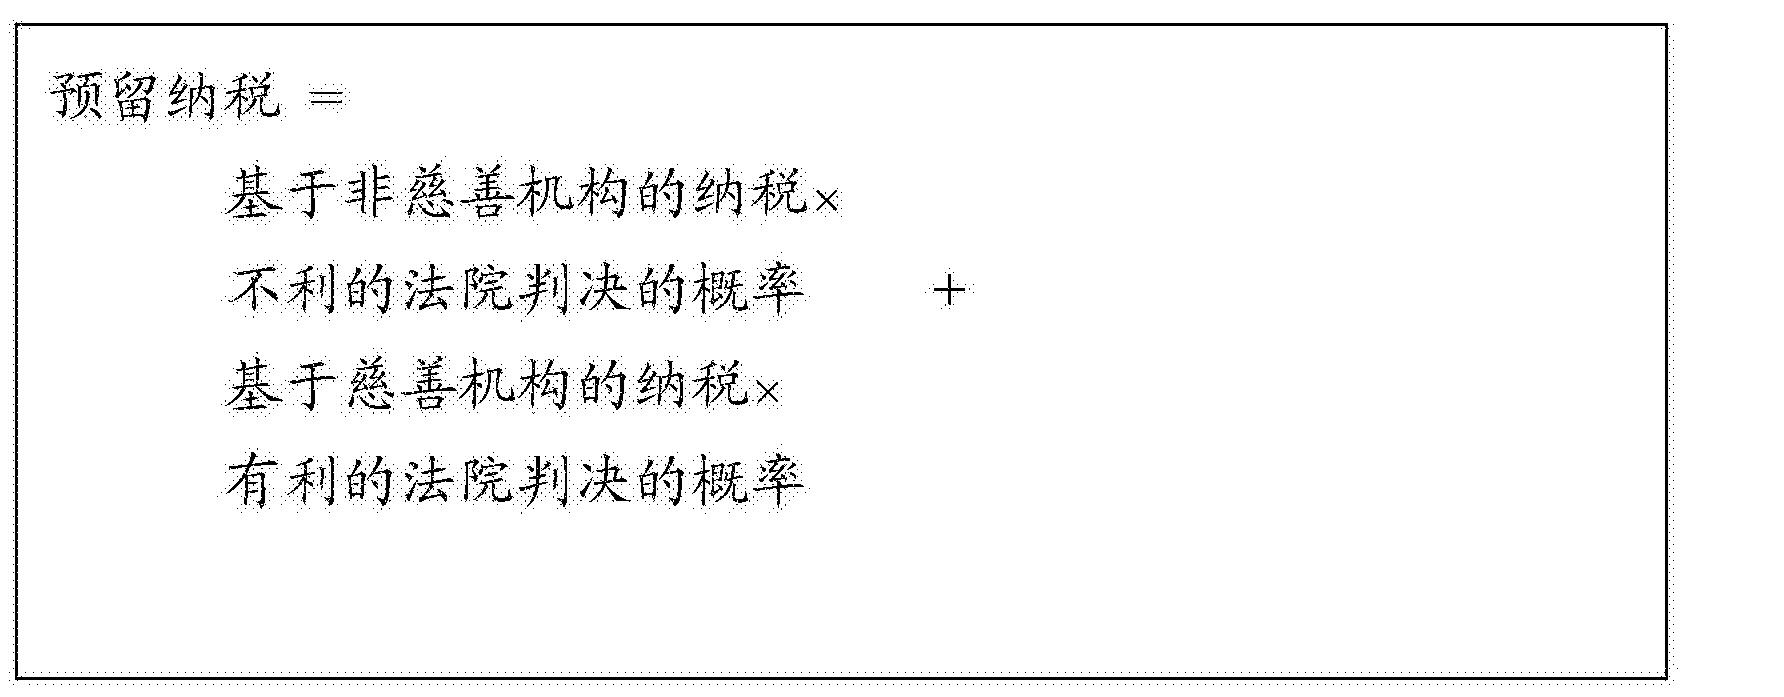 Figure CN107273977AD00371